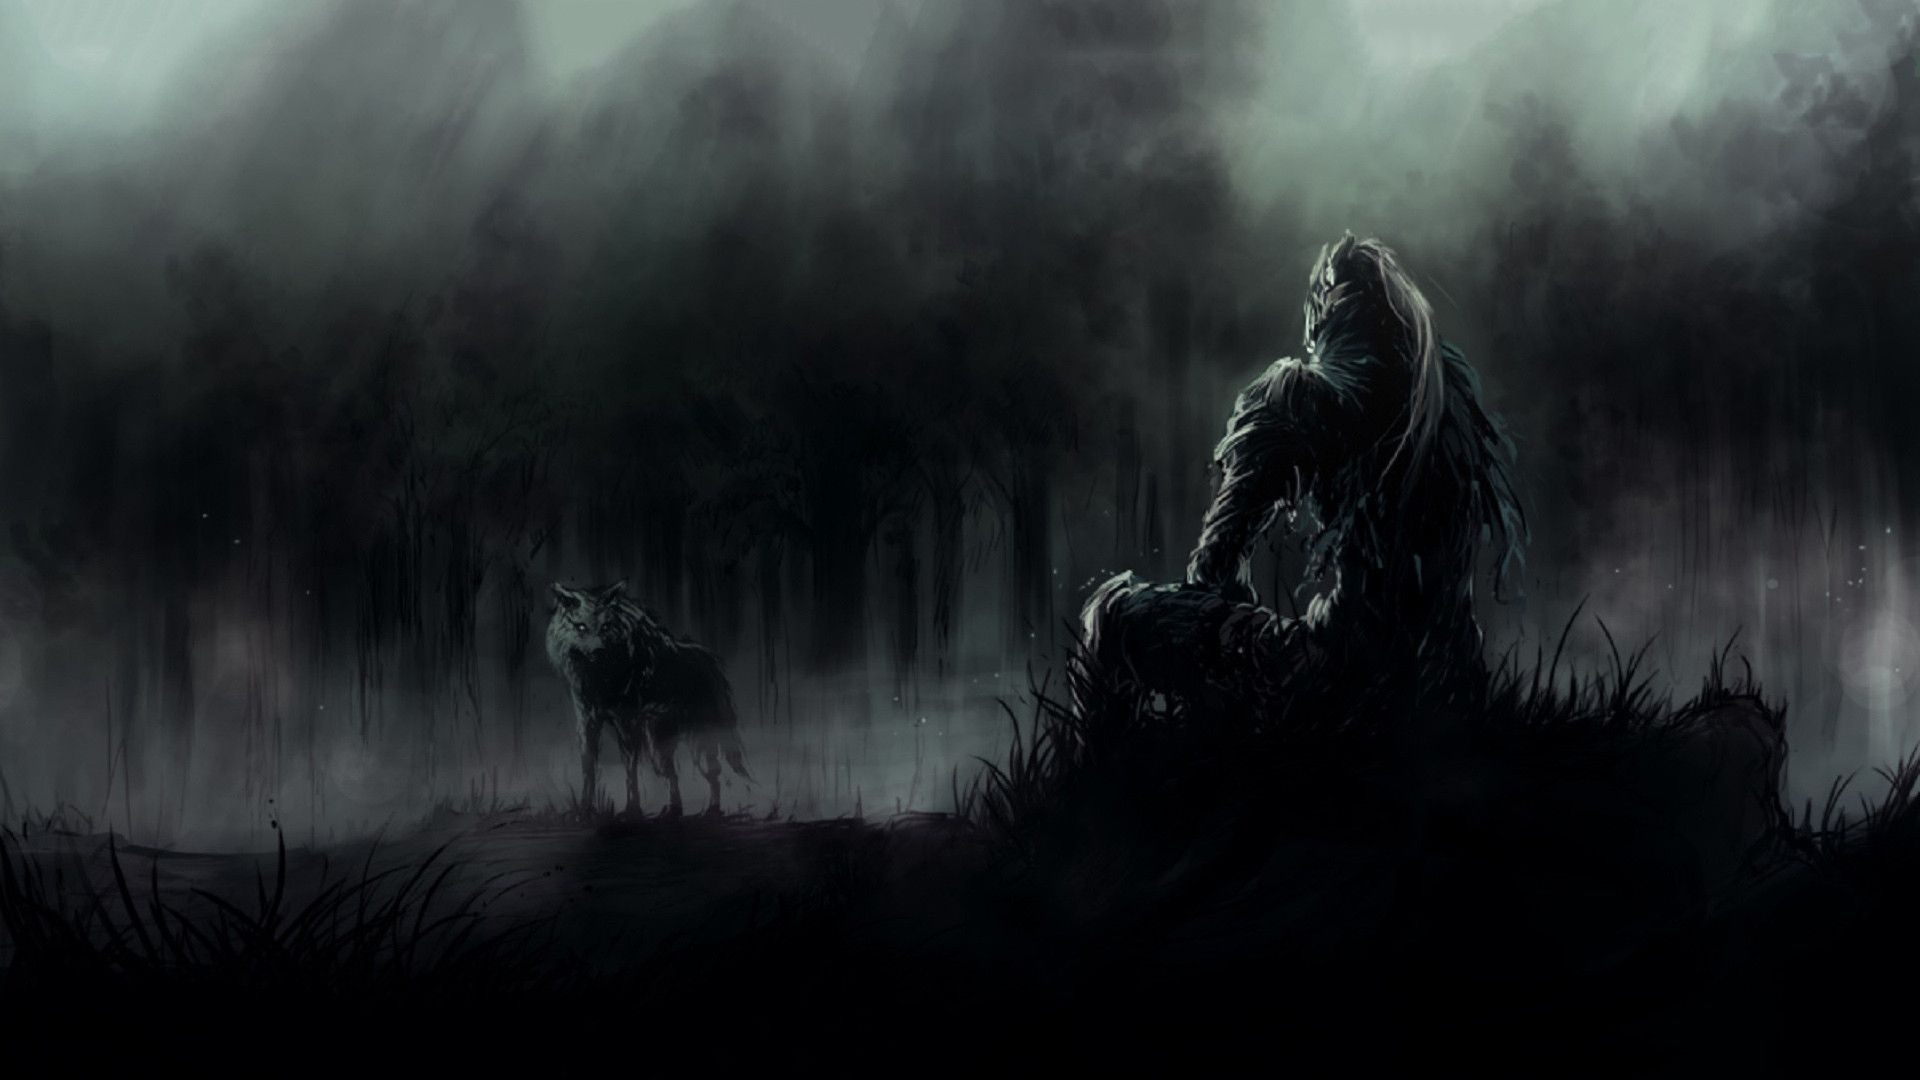 Dark Evil Wolf Wallpapers Top Free Dark Evil Wolf Backgrounds